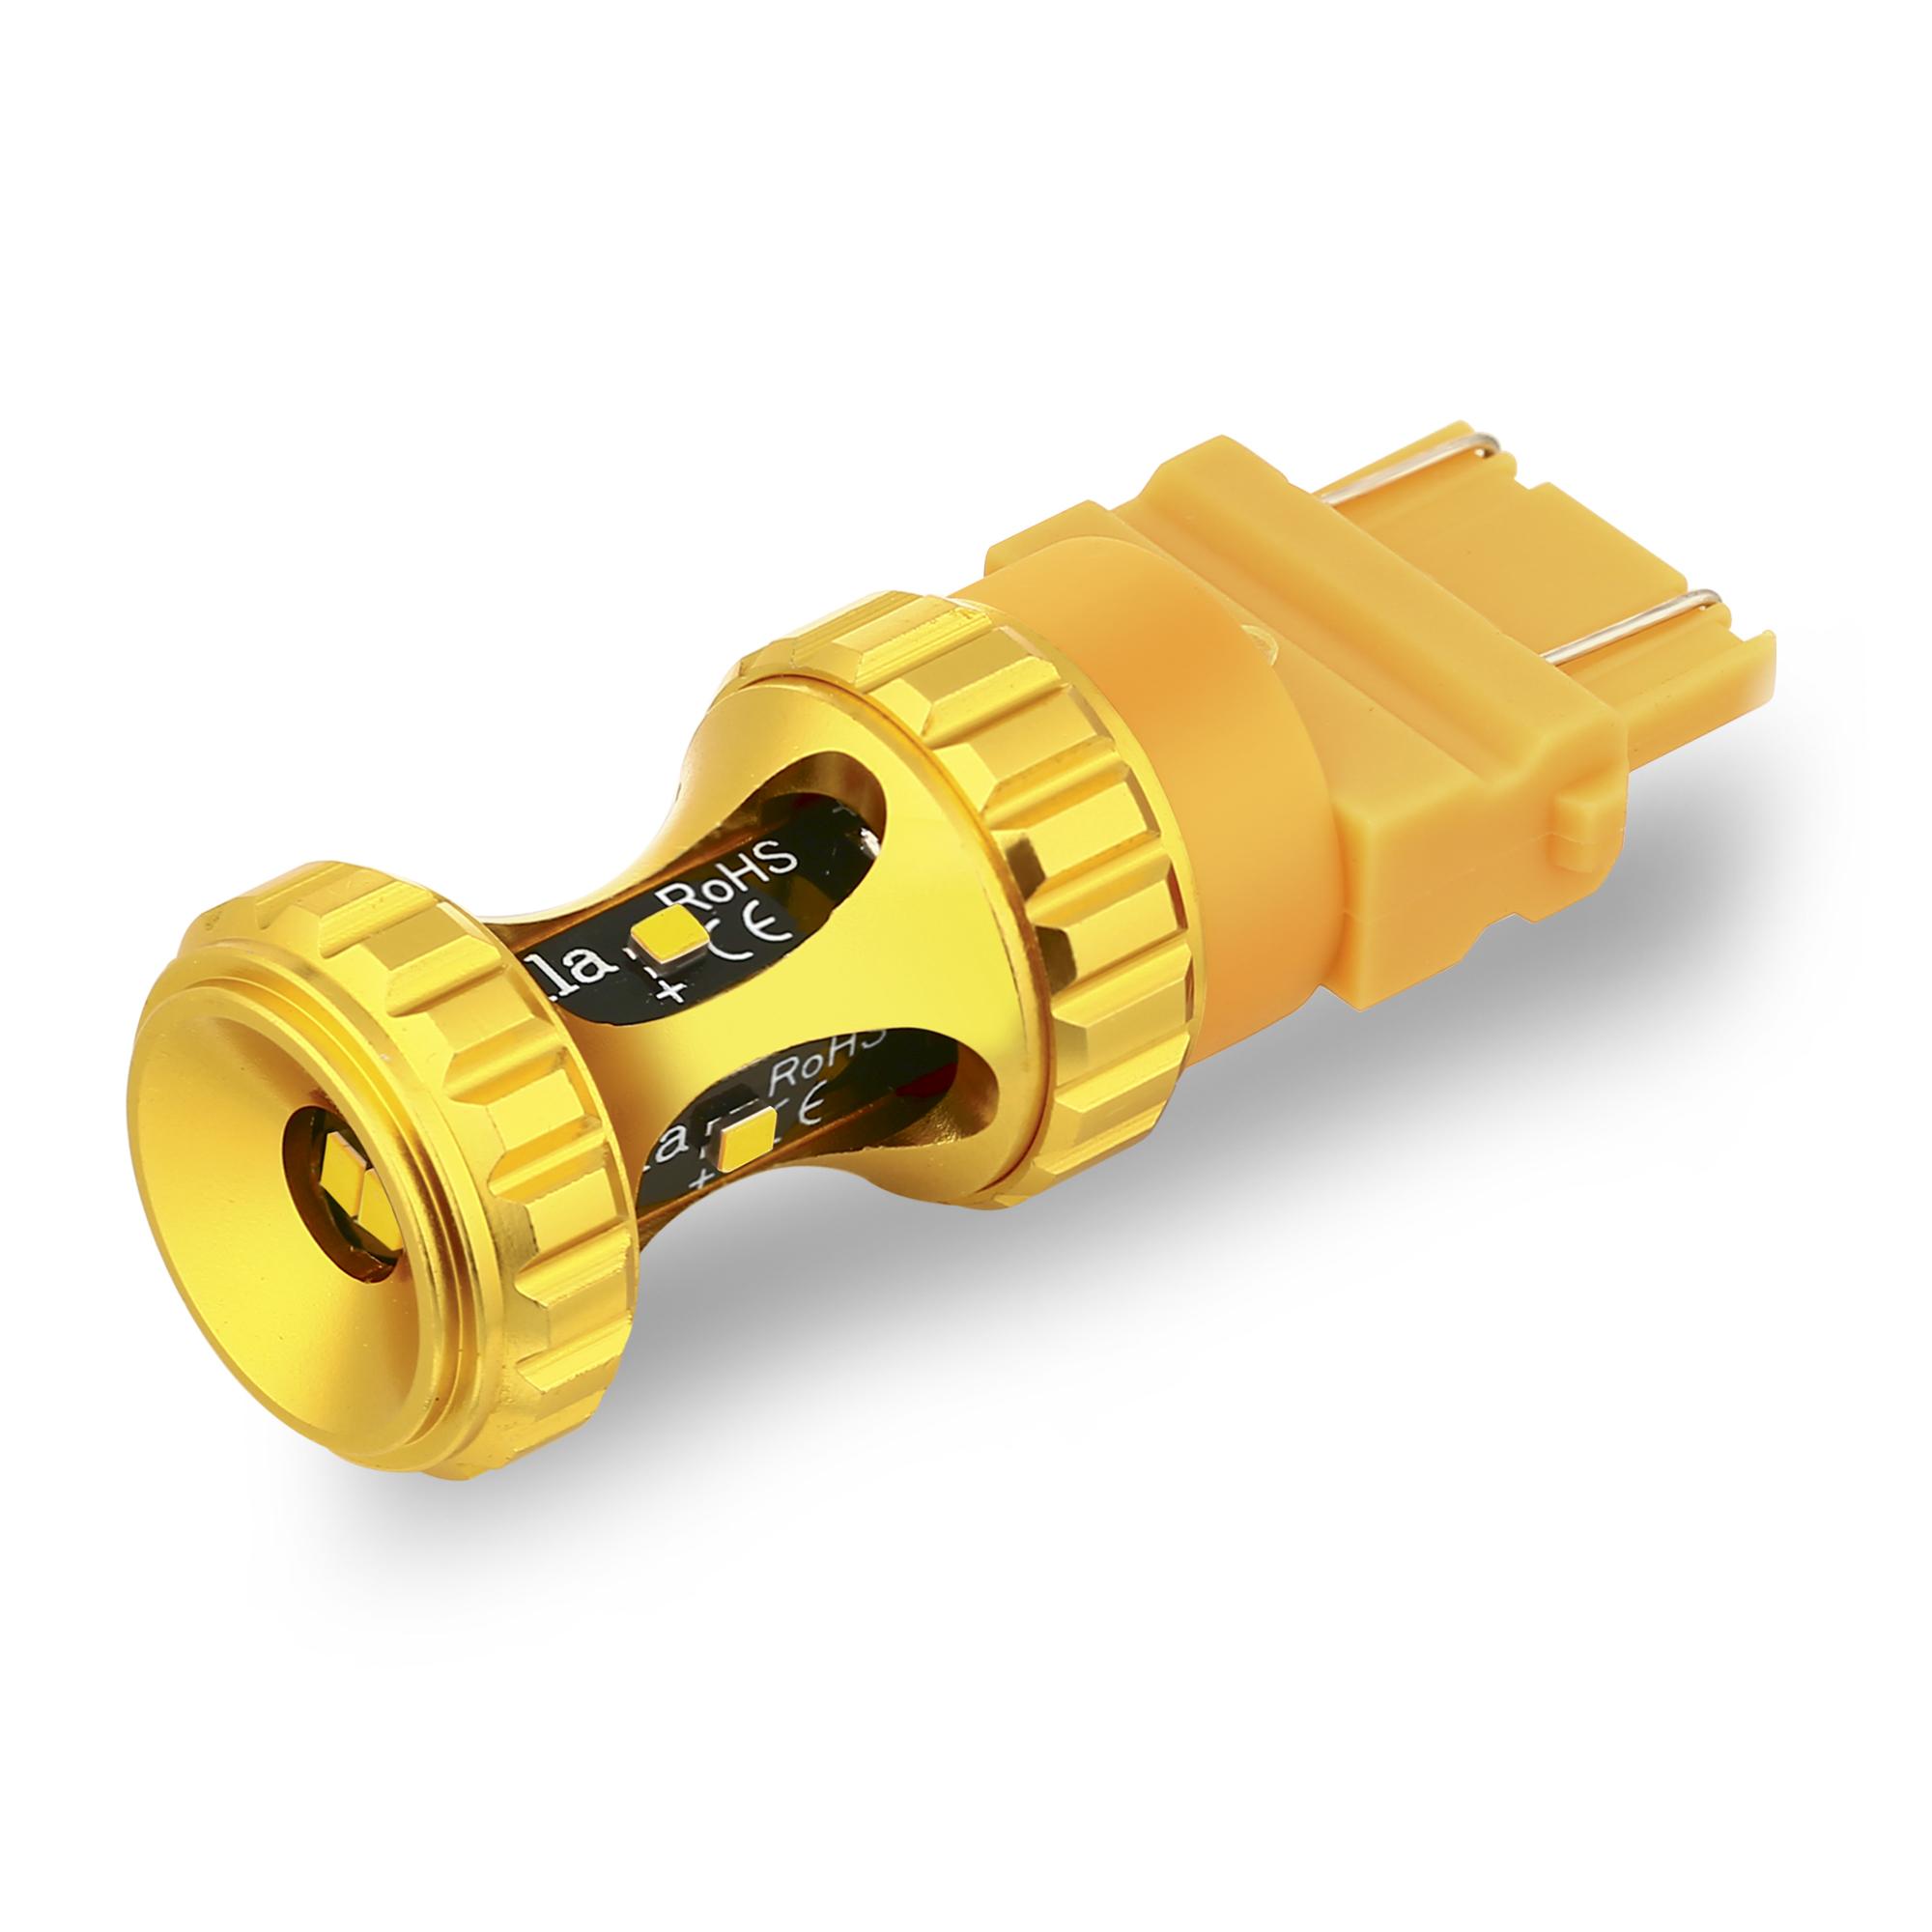 2015 Toyota Tacoma LED Rear Turn Signal Light Bulb 12V Replacement